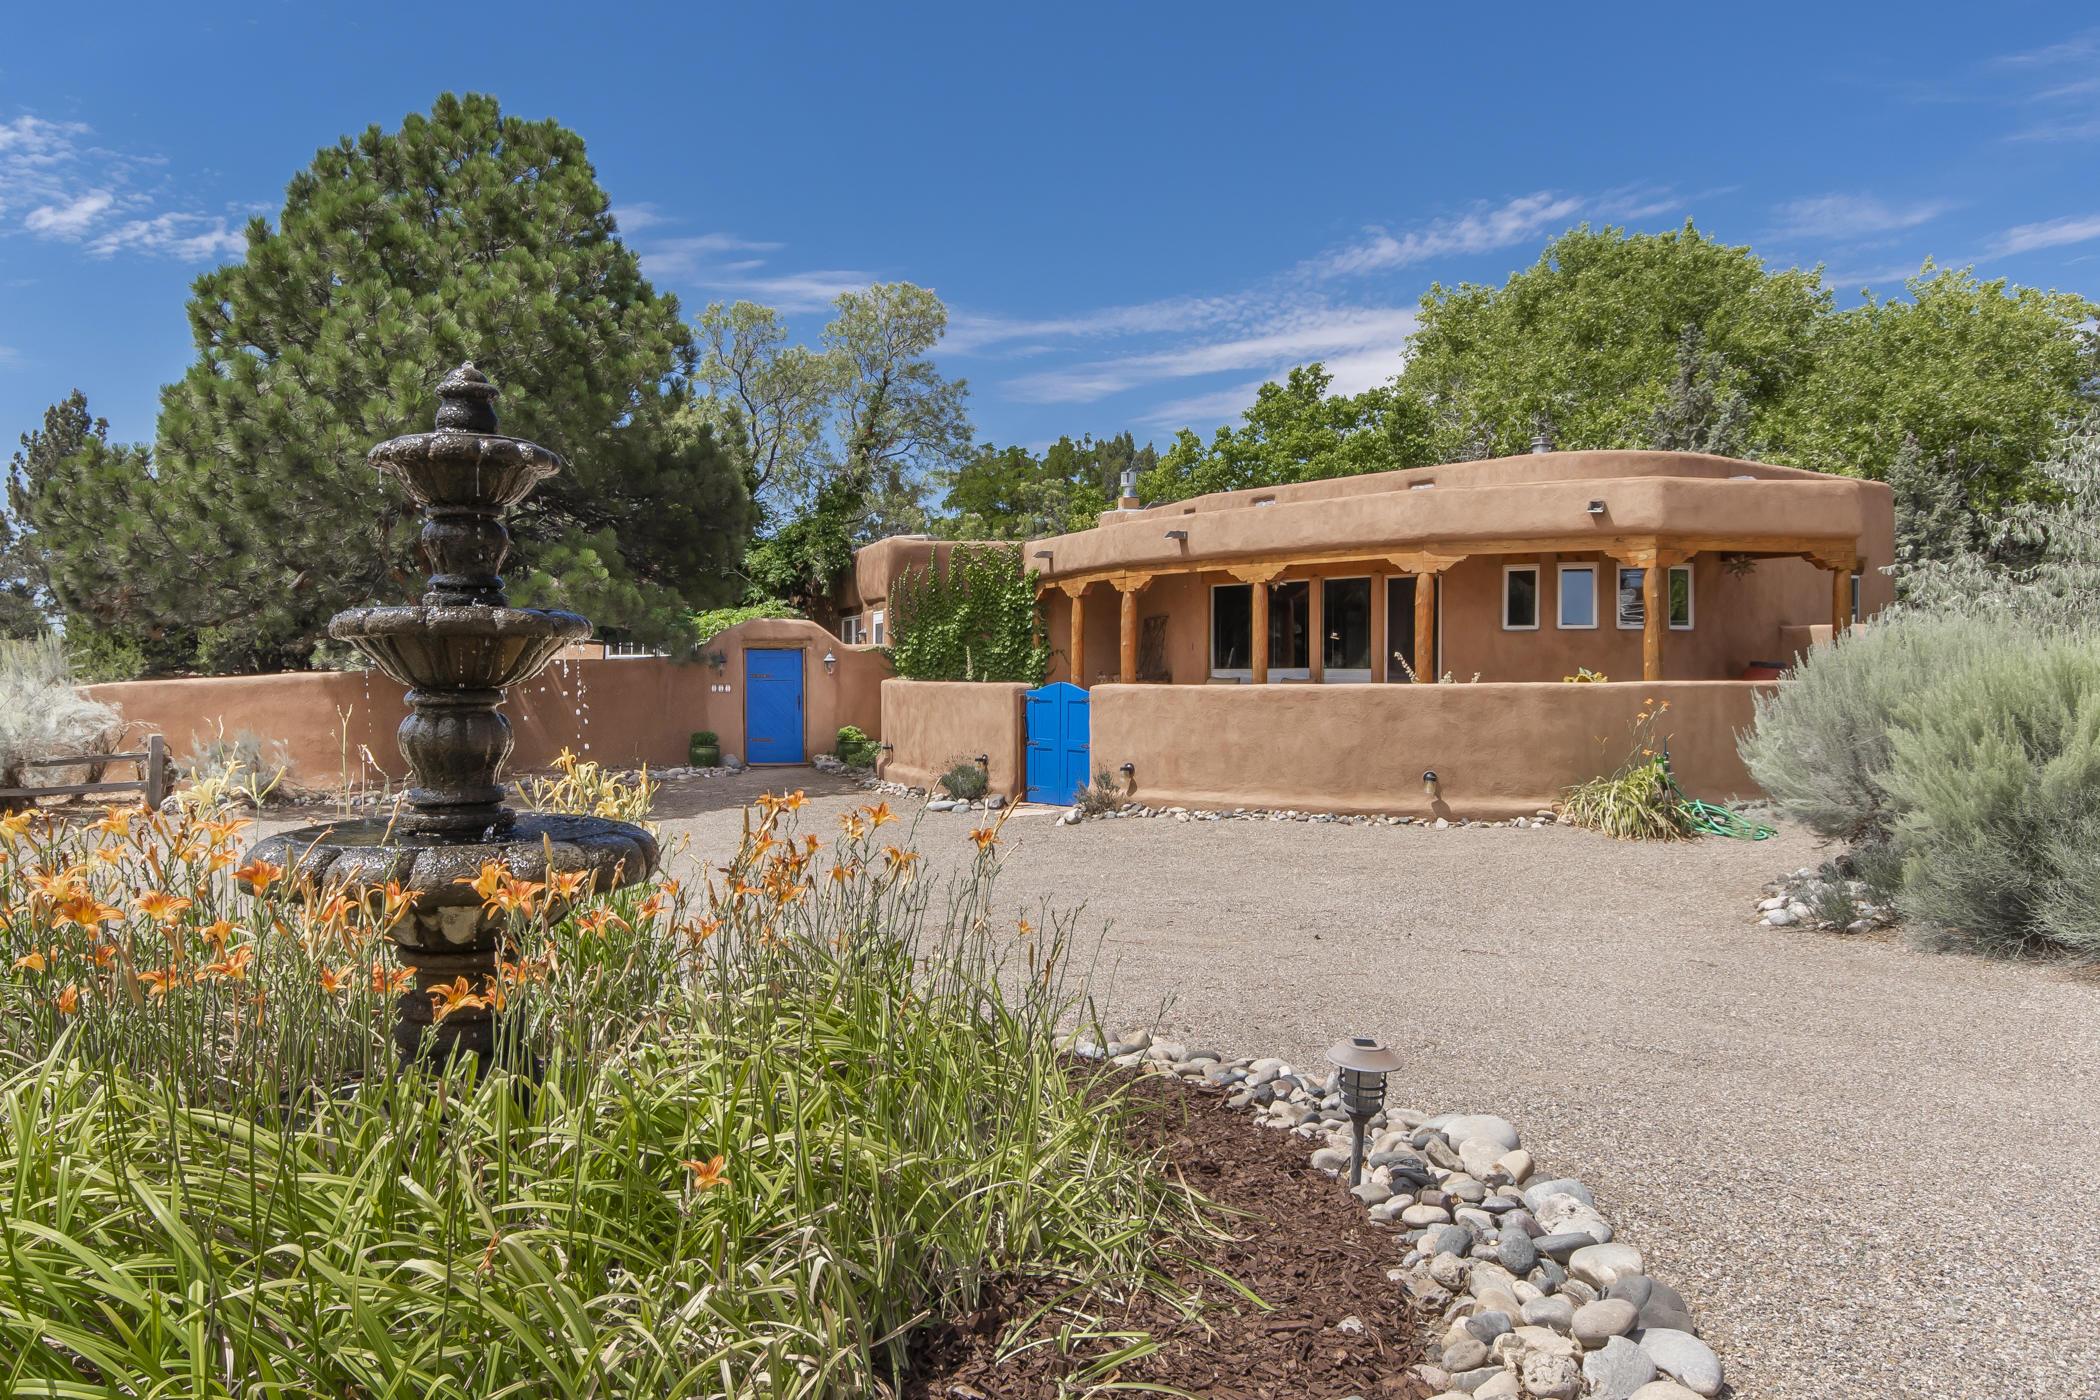 341 Cielo Azul Road, Corrales, NM 87048 - Corrales, NM real estate listing